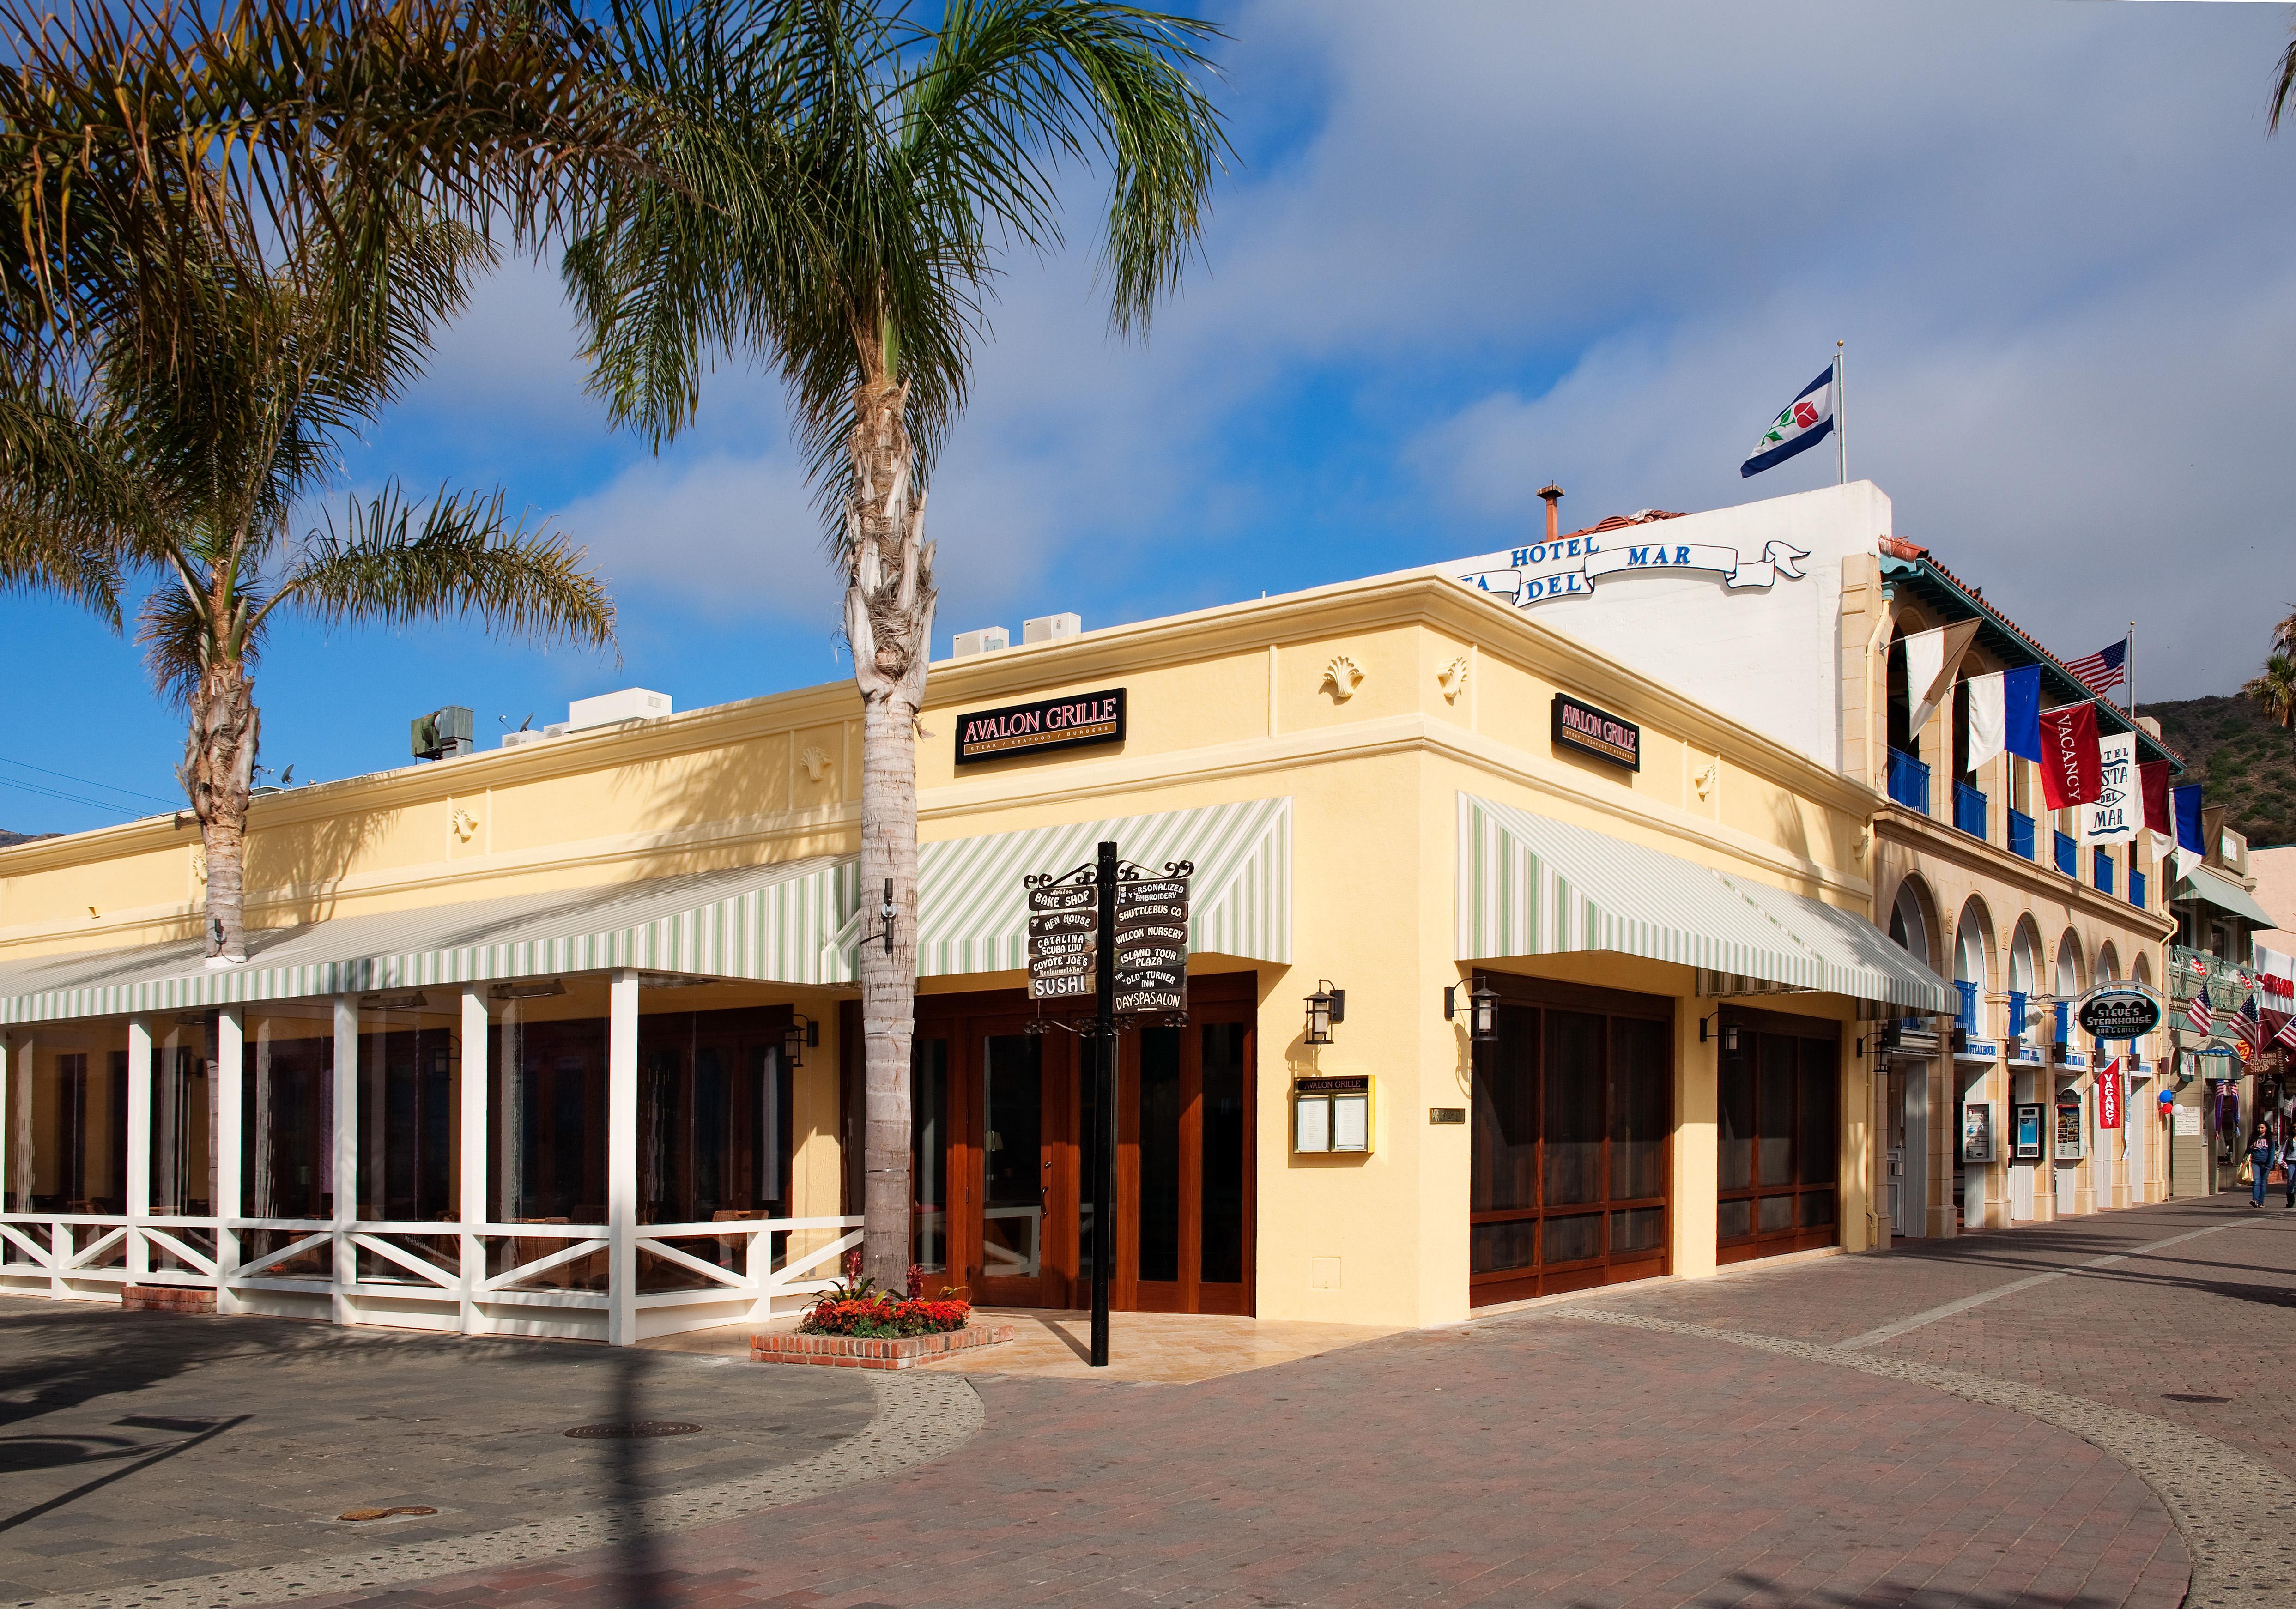 Avalon grille santa catalina island r d olson for Exterior restaurant design